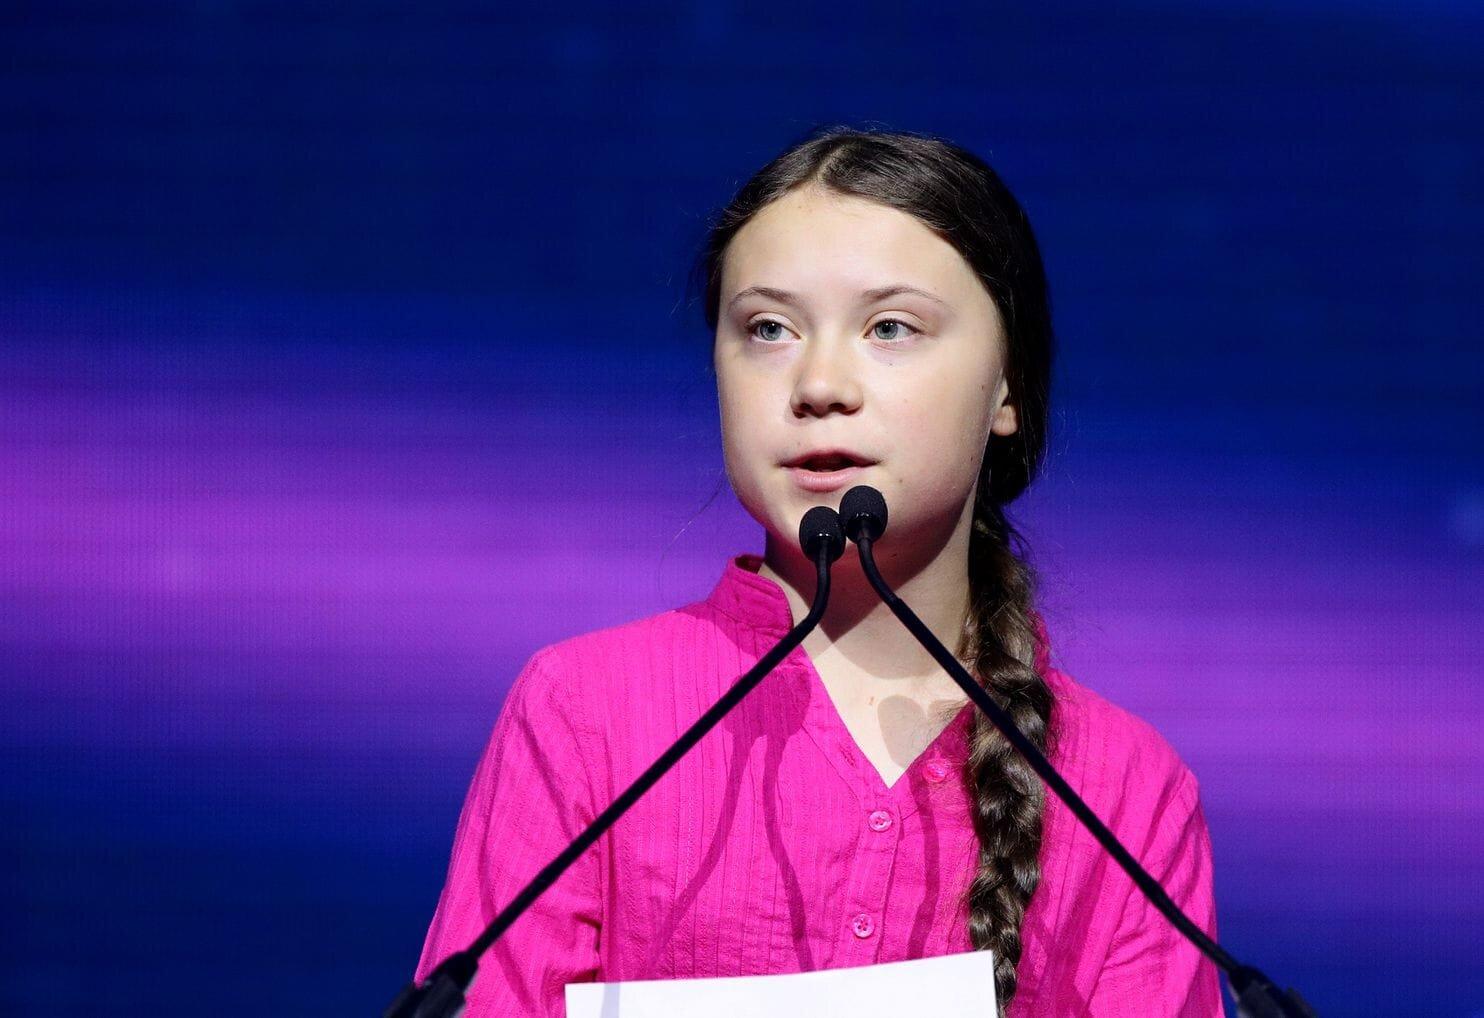 Greta Thunberg Climate Change